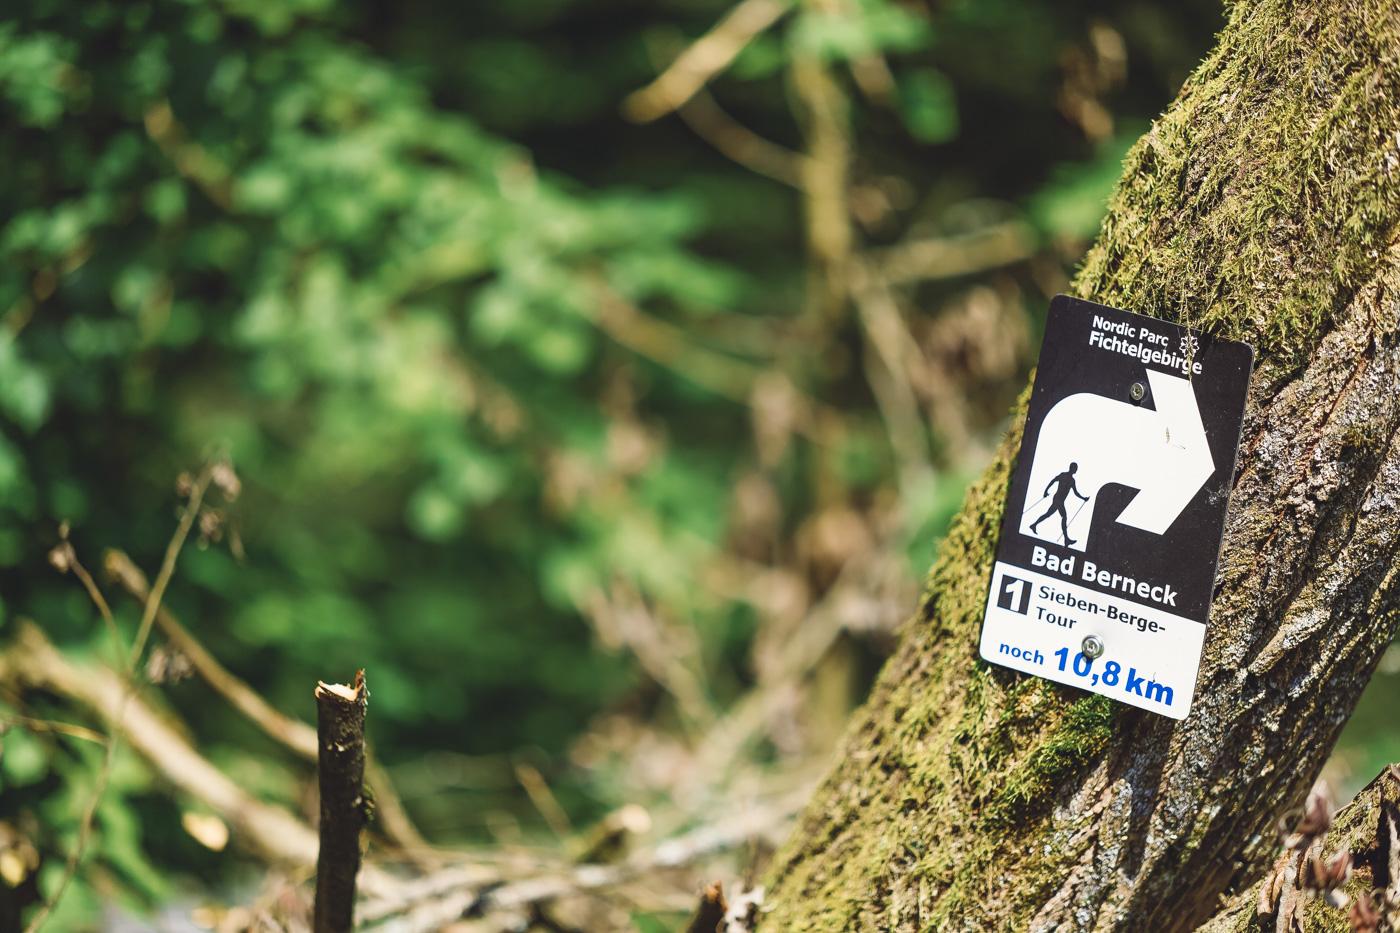 Nordic Walking Parc Bad Berneck